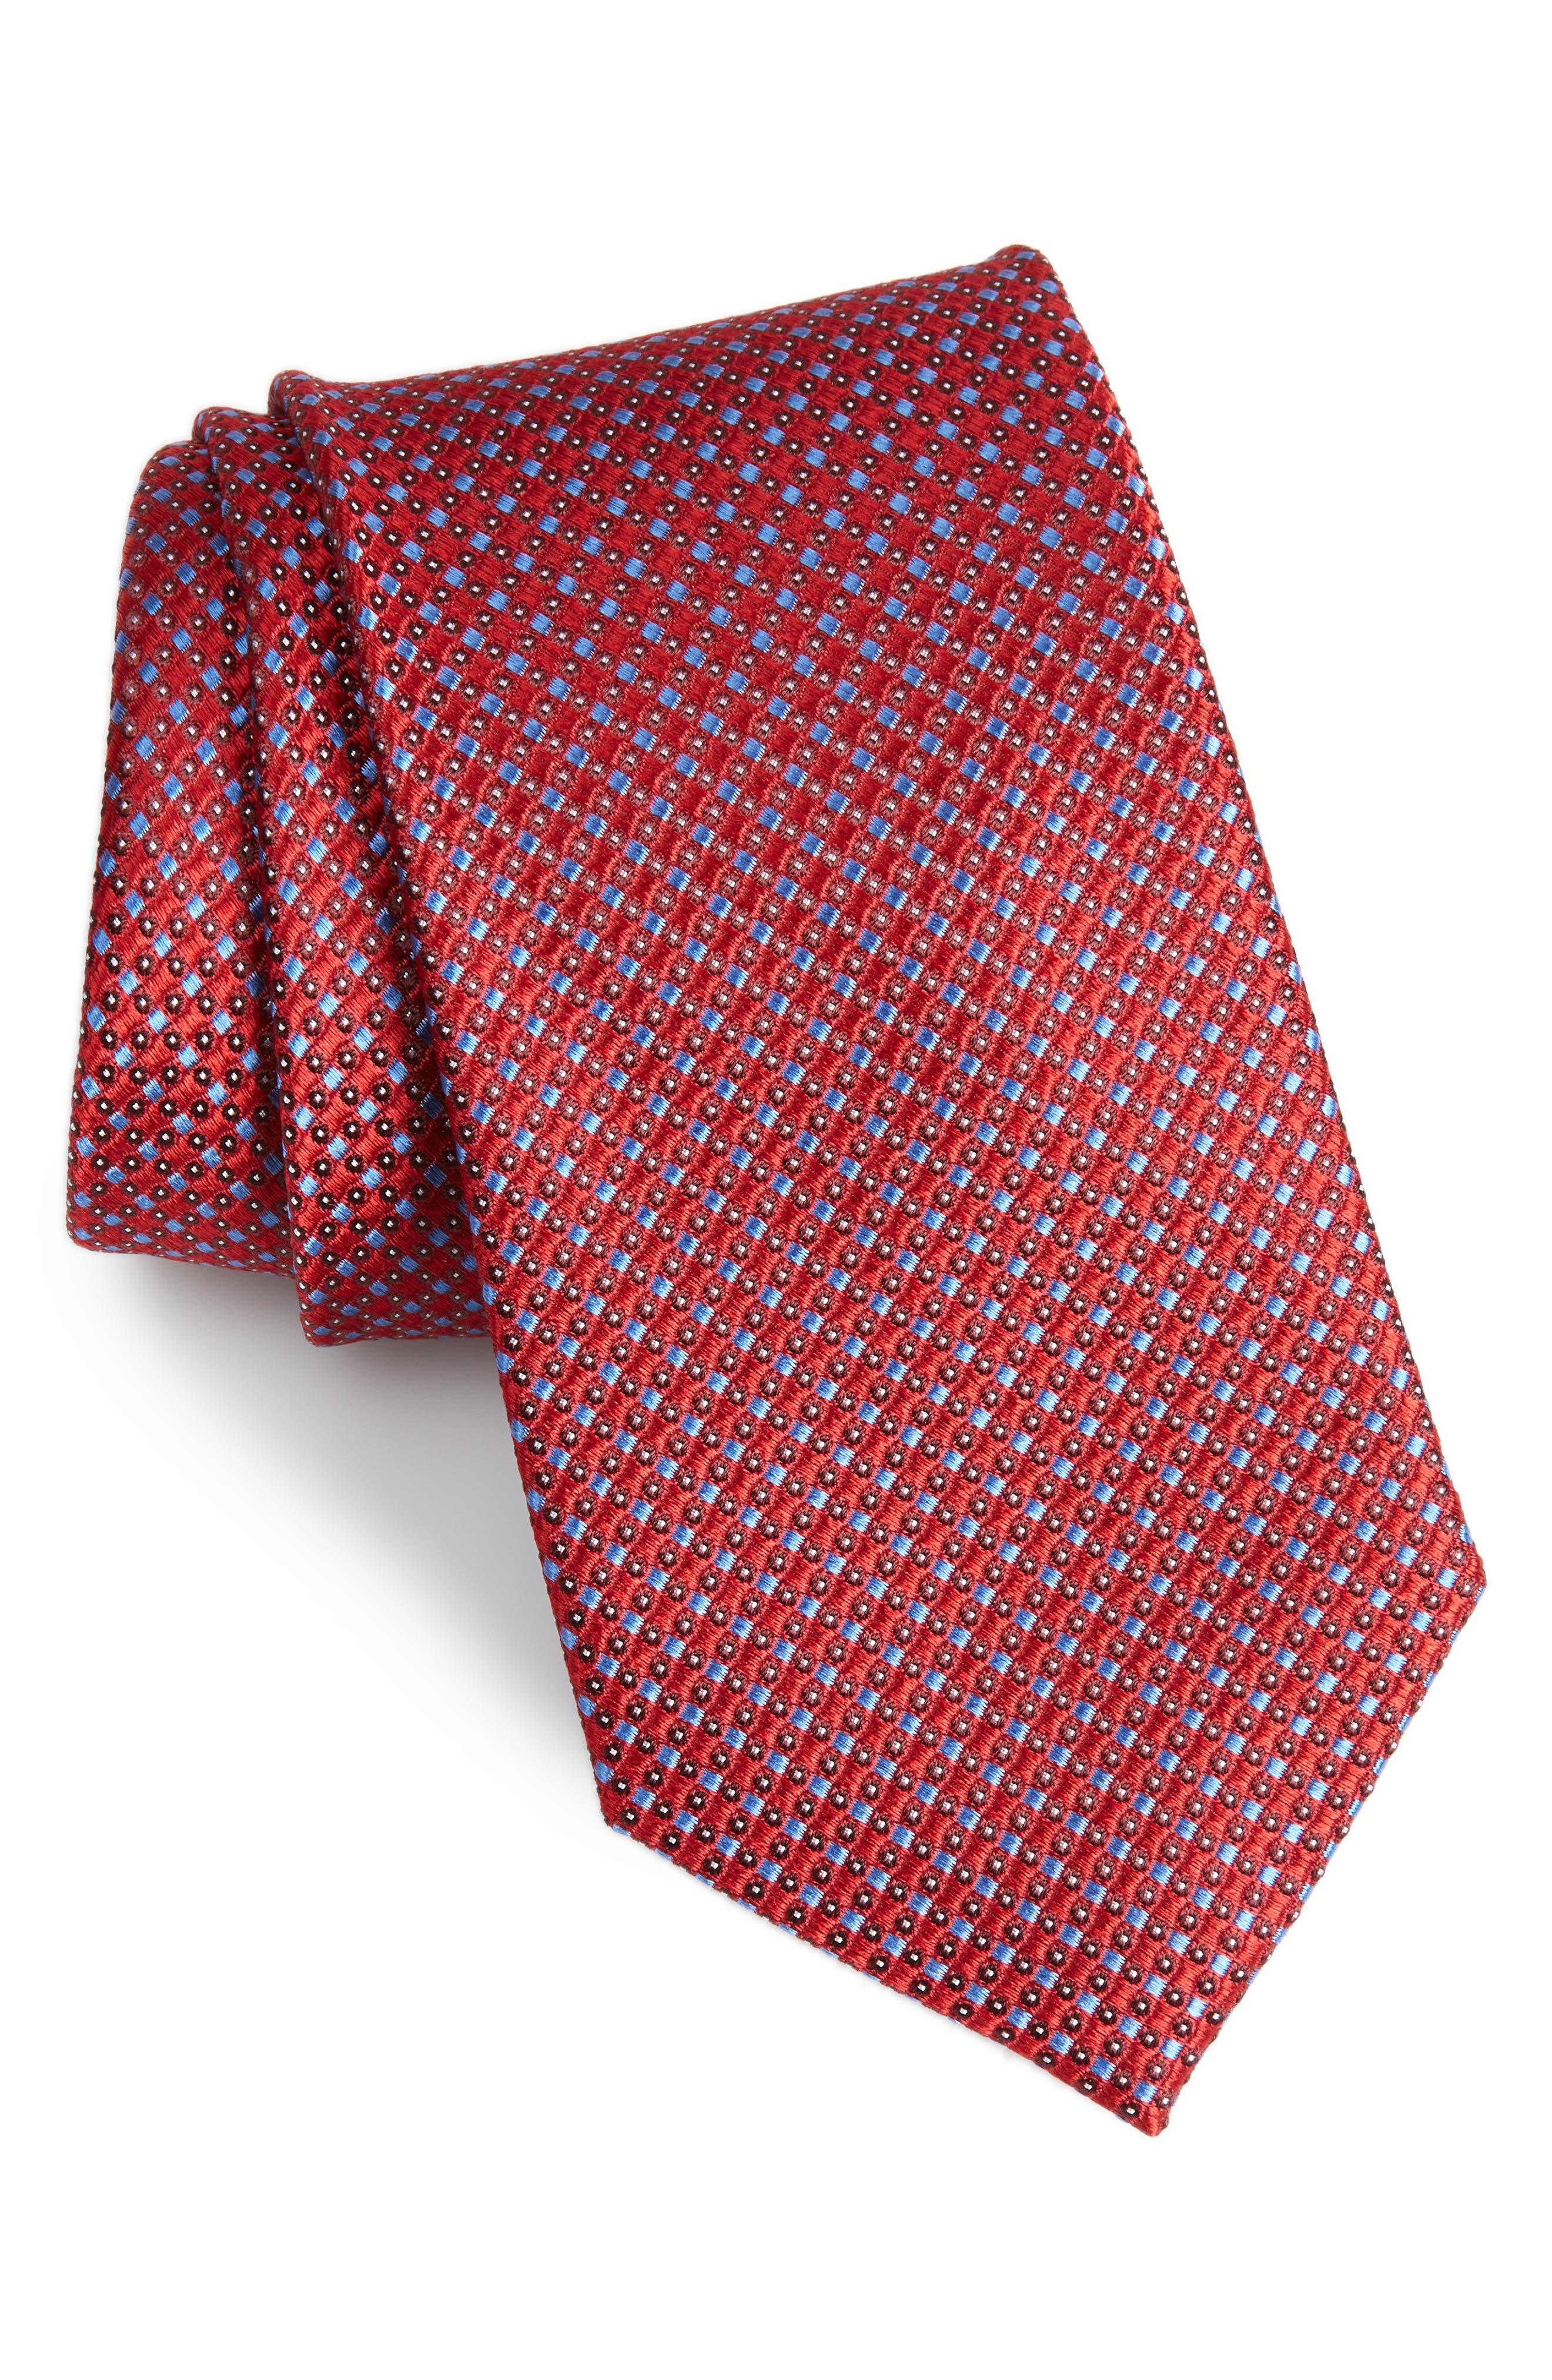 Bagni Check Tie,                             Main thumbnail 2, color,